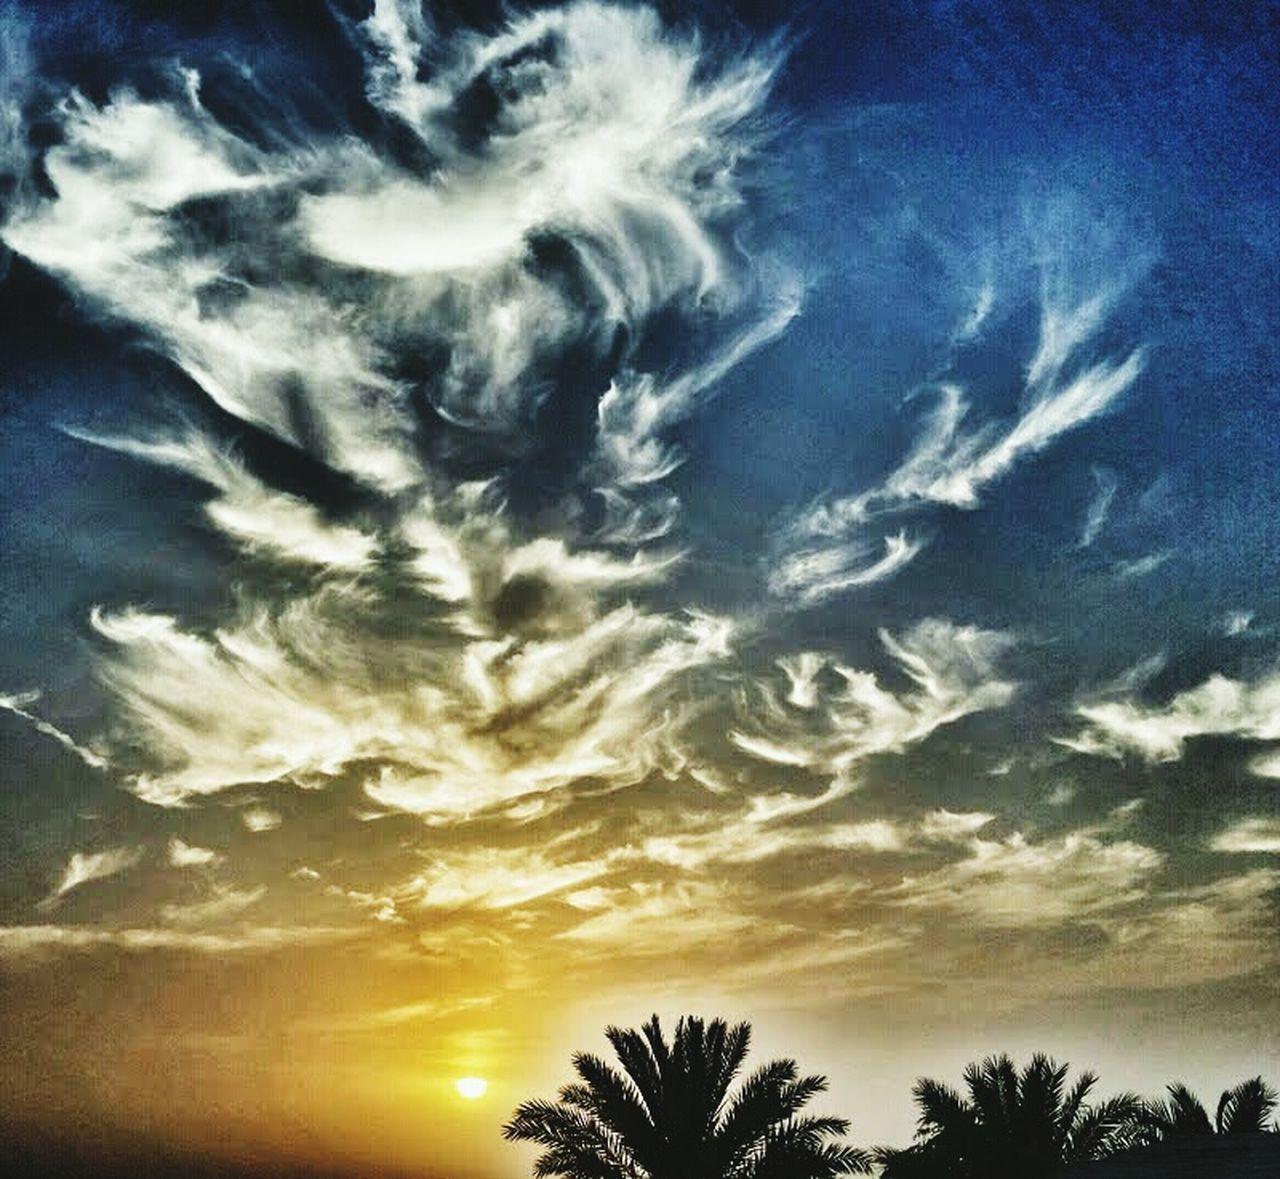 Cloud - Sky Sky Scenics Dramatic Sky Silhouette Cirrus Tree Beauty In Nature Sunset Dubai Desert Travel Palm Tree Palm Tree Silhouette Sunset Sunset Silhouettes Outdoors Clouds & Sky Welcome To Black EyeEmNewHere The Great Outdoors - 2017 EyeEm Awards